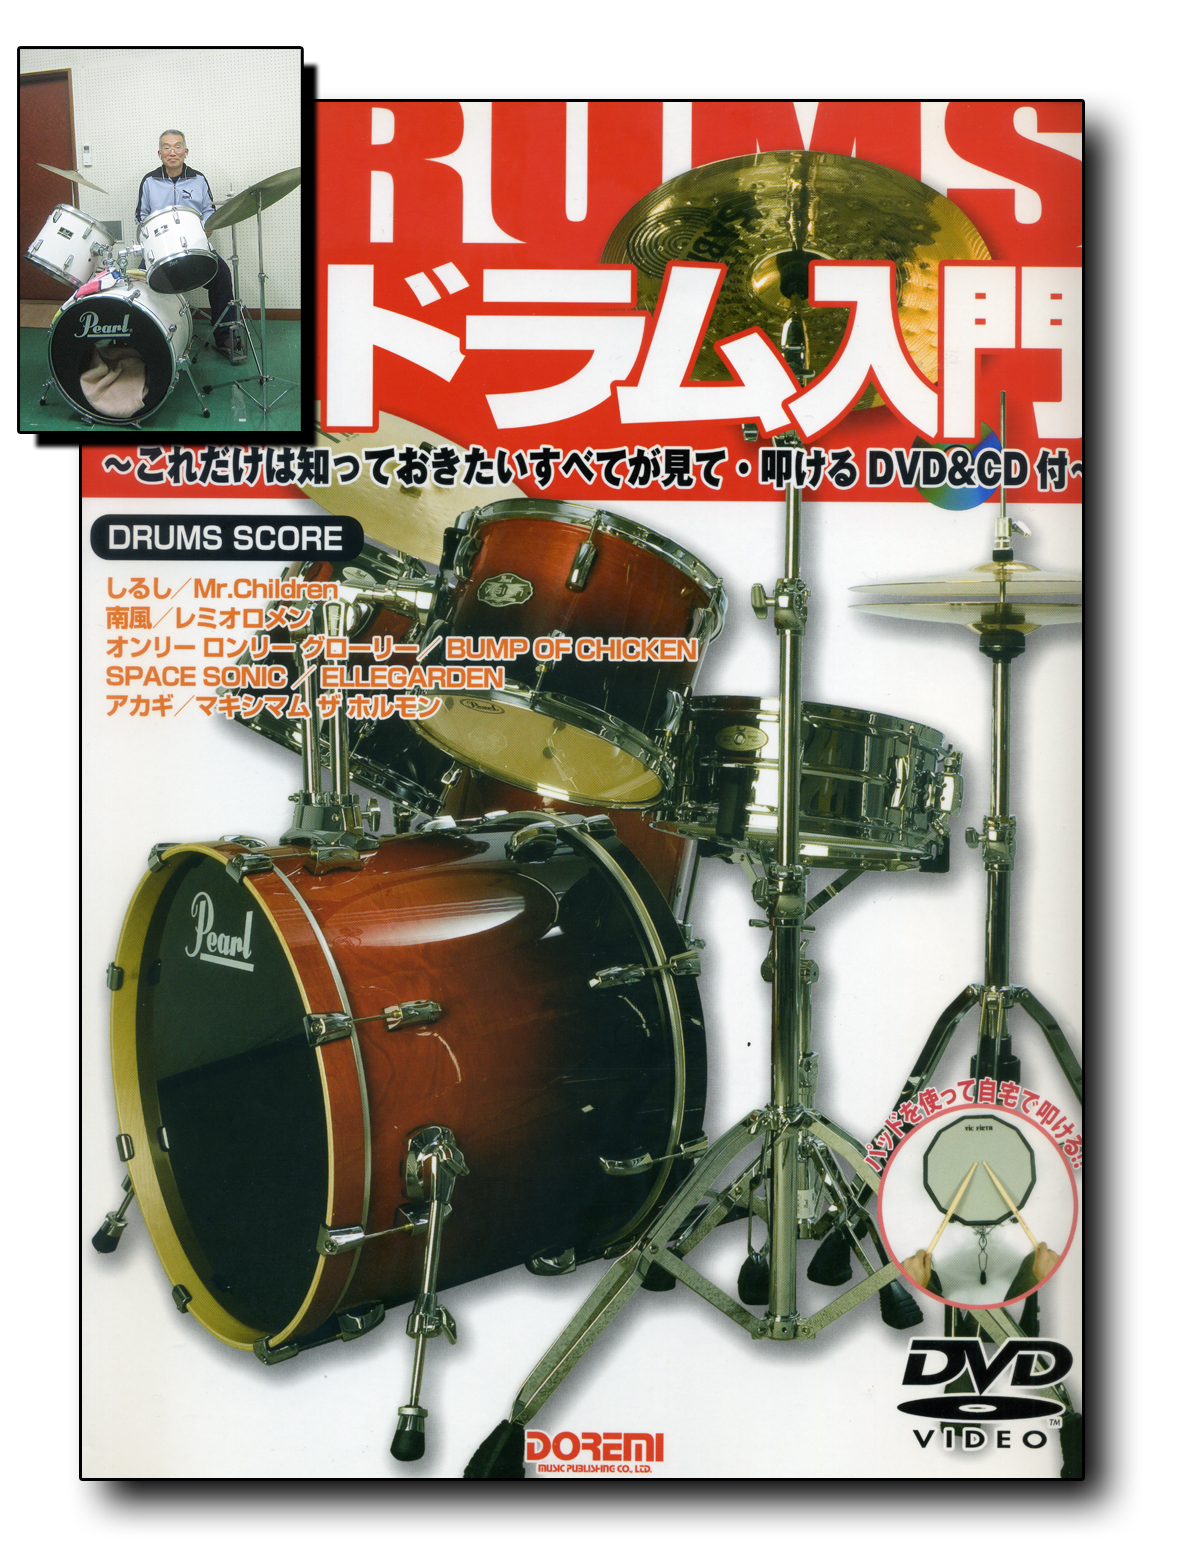 DVD付きドラム教則本『ドラム入門』。